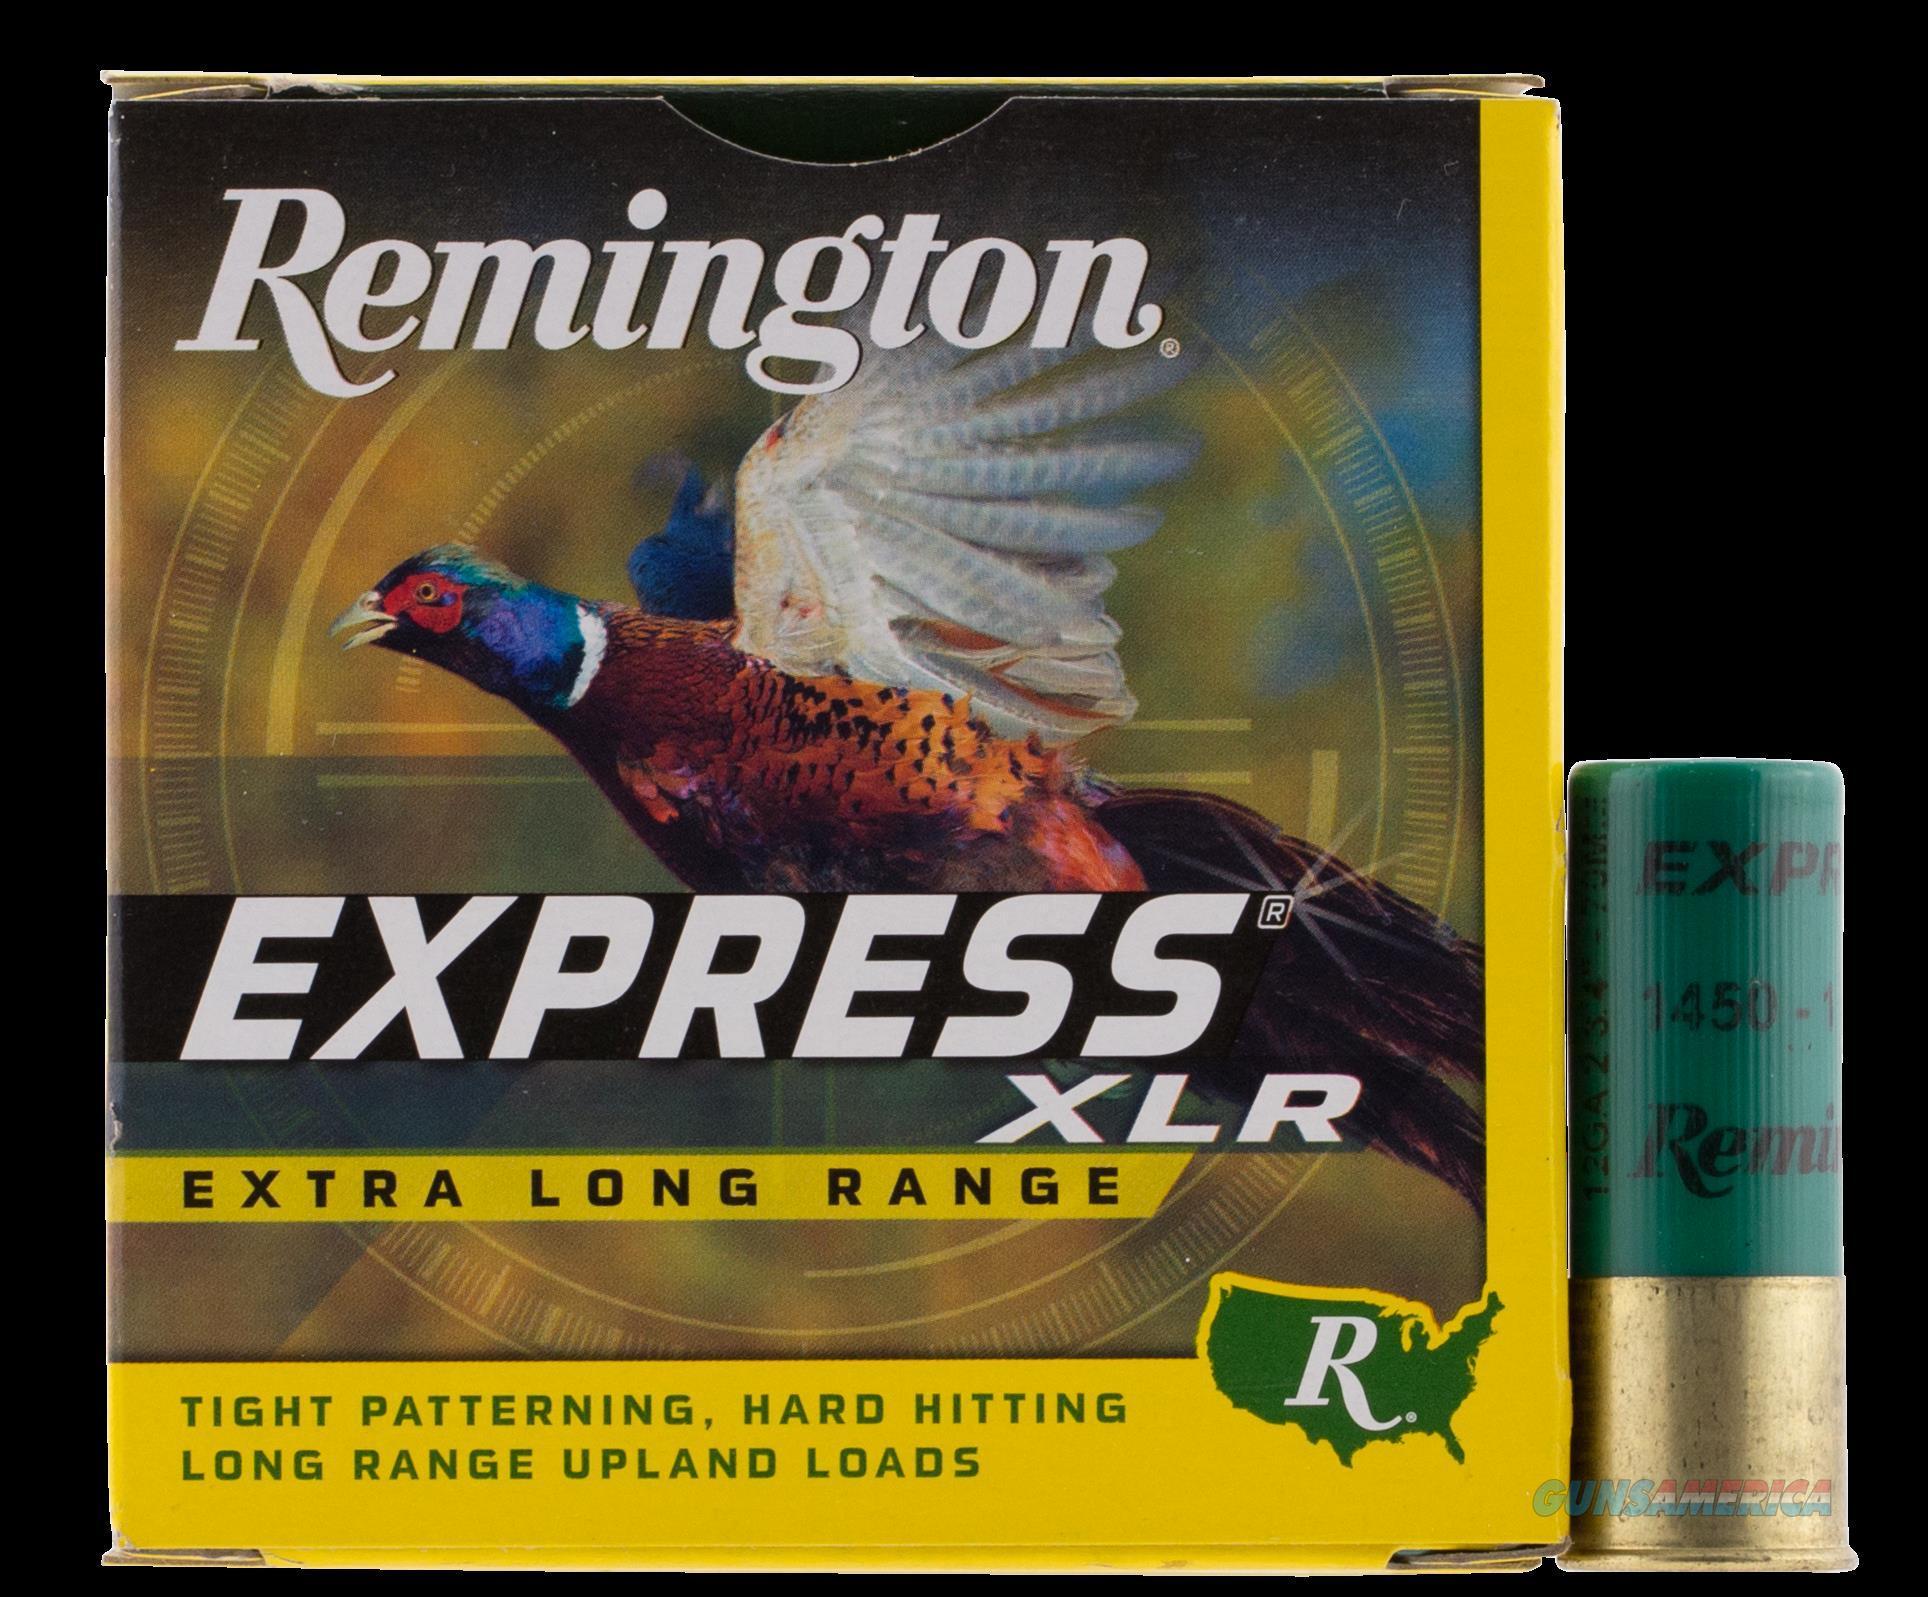 Remington Ammunition Express Xlr, Rem 20168 Nehv126  12  Extra Long Rng  25-10  Guns > Pistols > 1911 Pistol Copies (non-Colt)